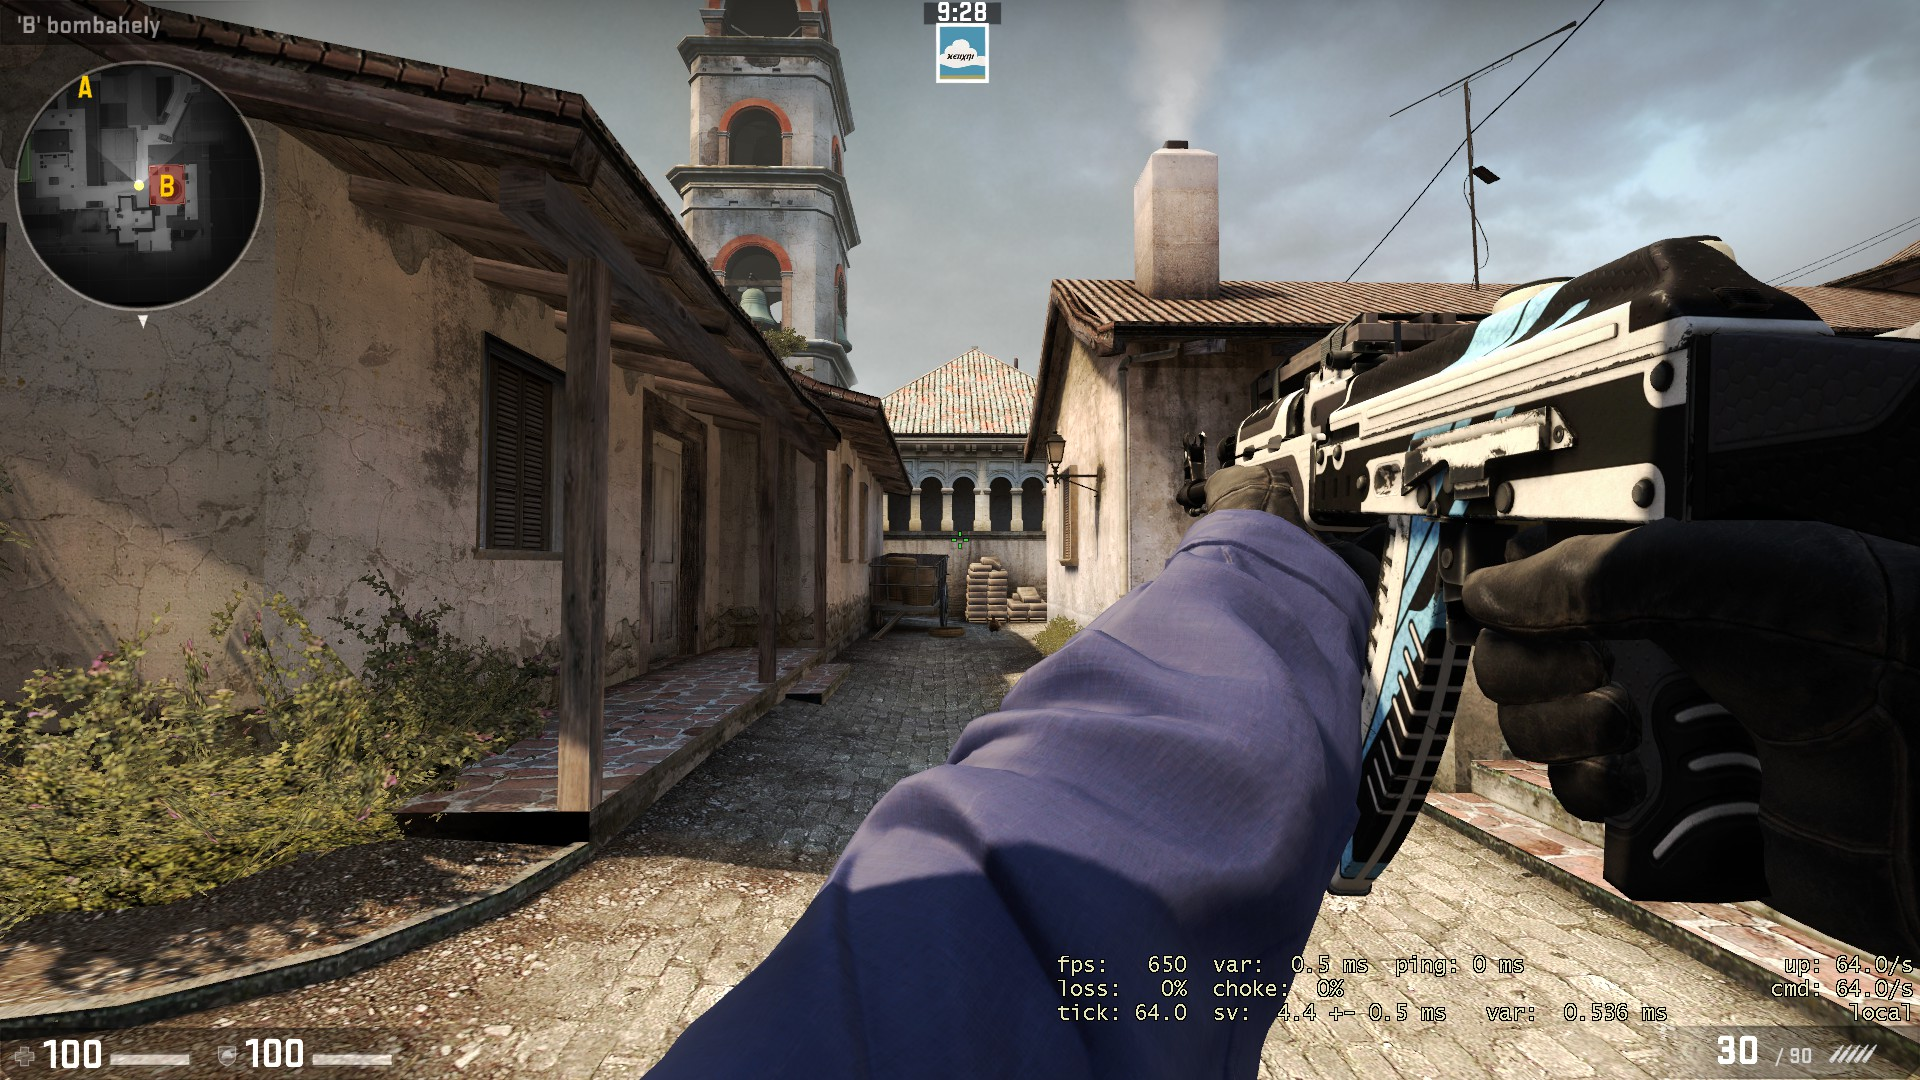 Steam Community :: Guide :: CS:GO Viewmodel commands for edits